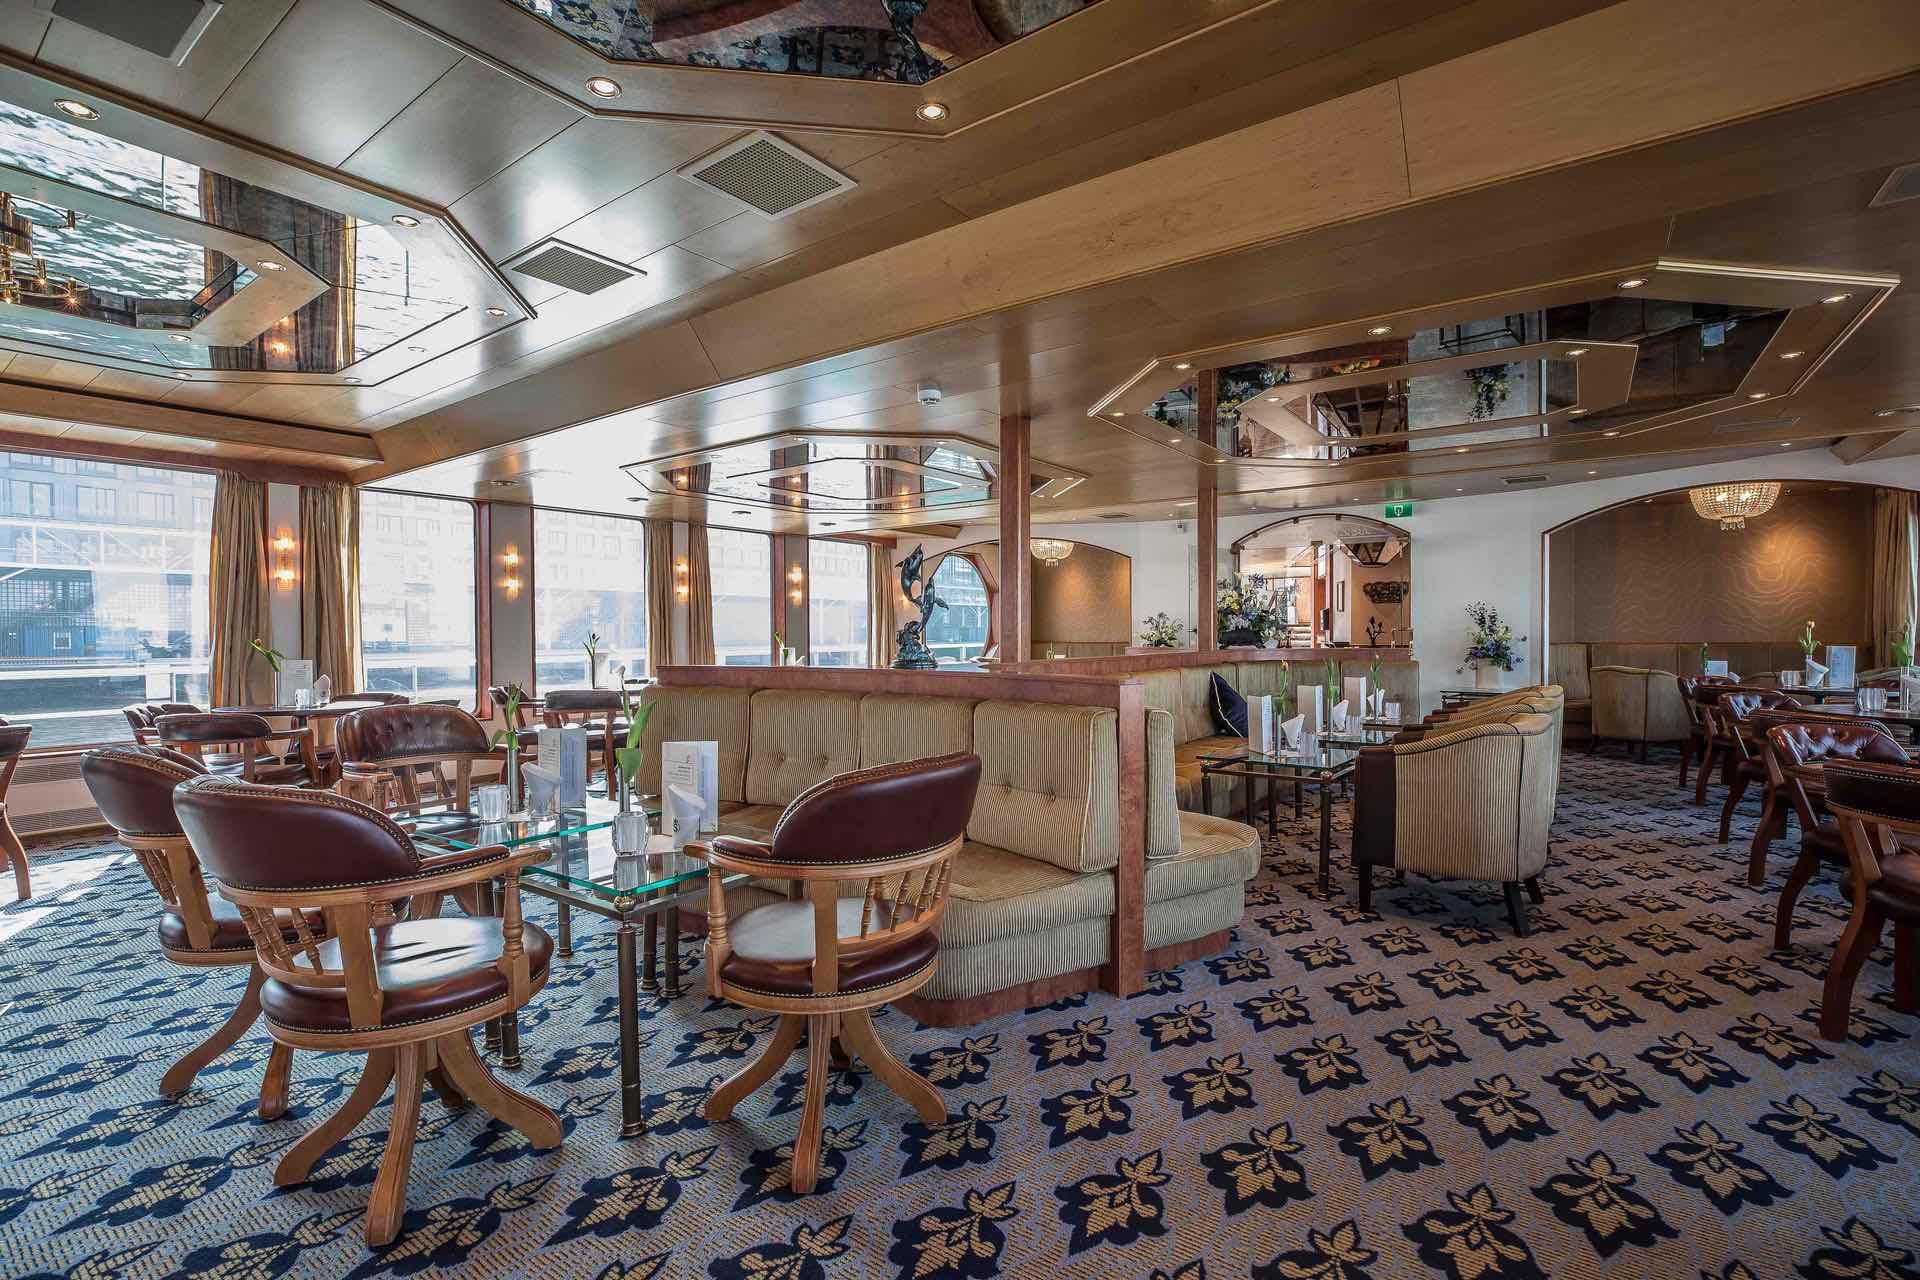 MS Swiss Crown Panorama Lounge